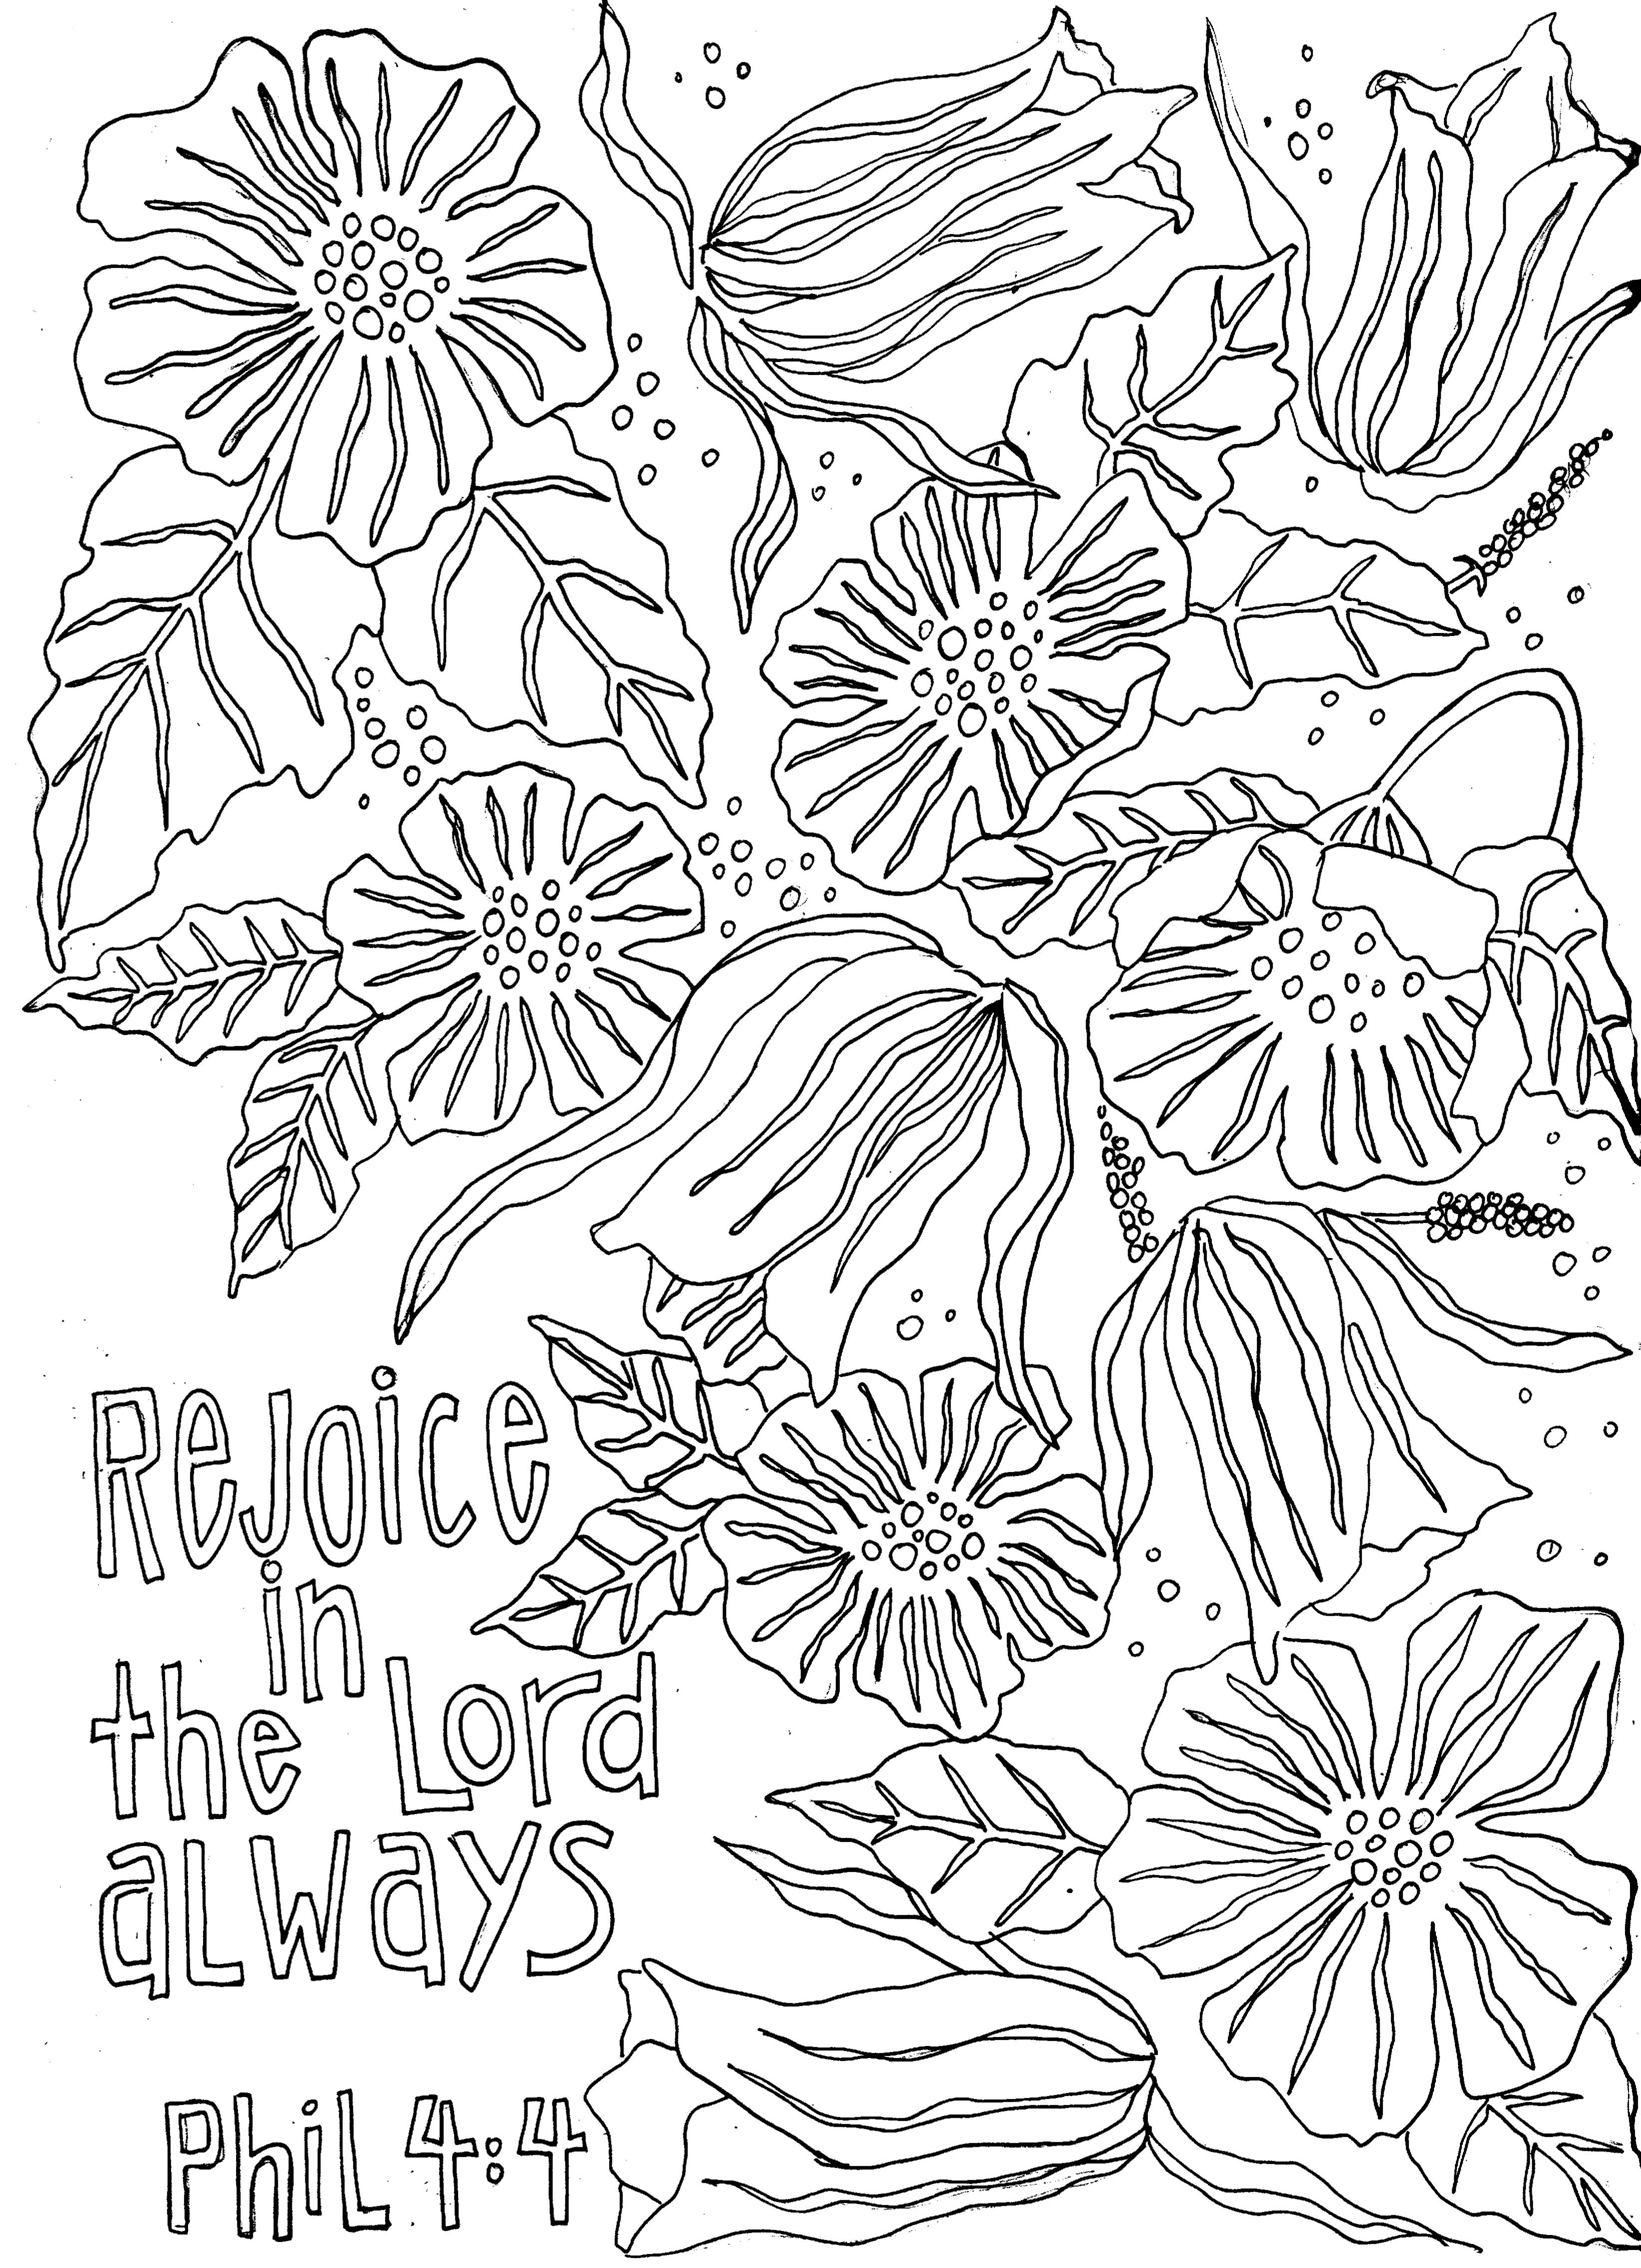 rejoice coloring pages - photo#34